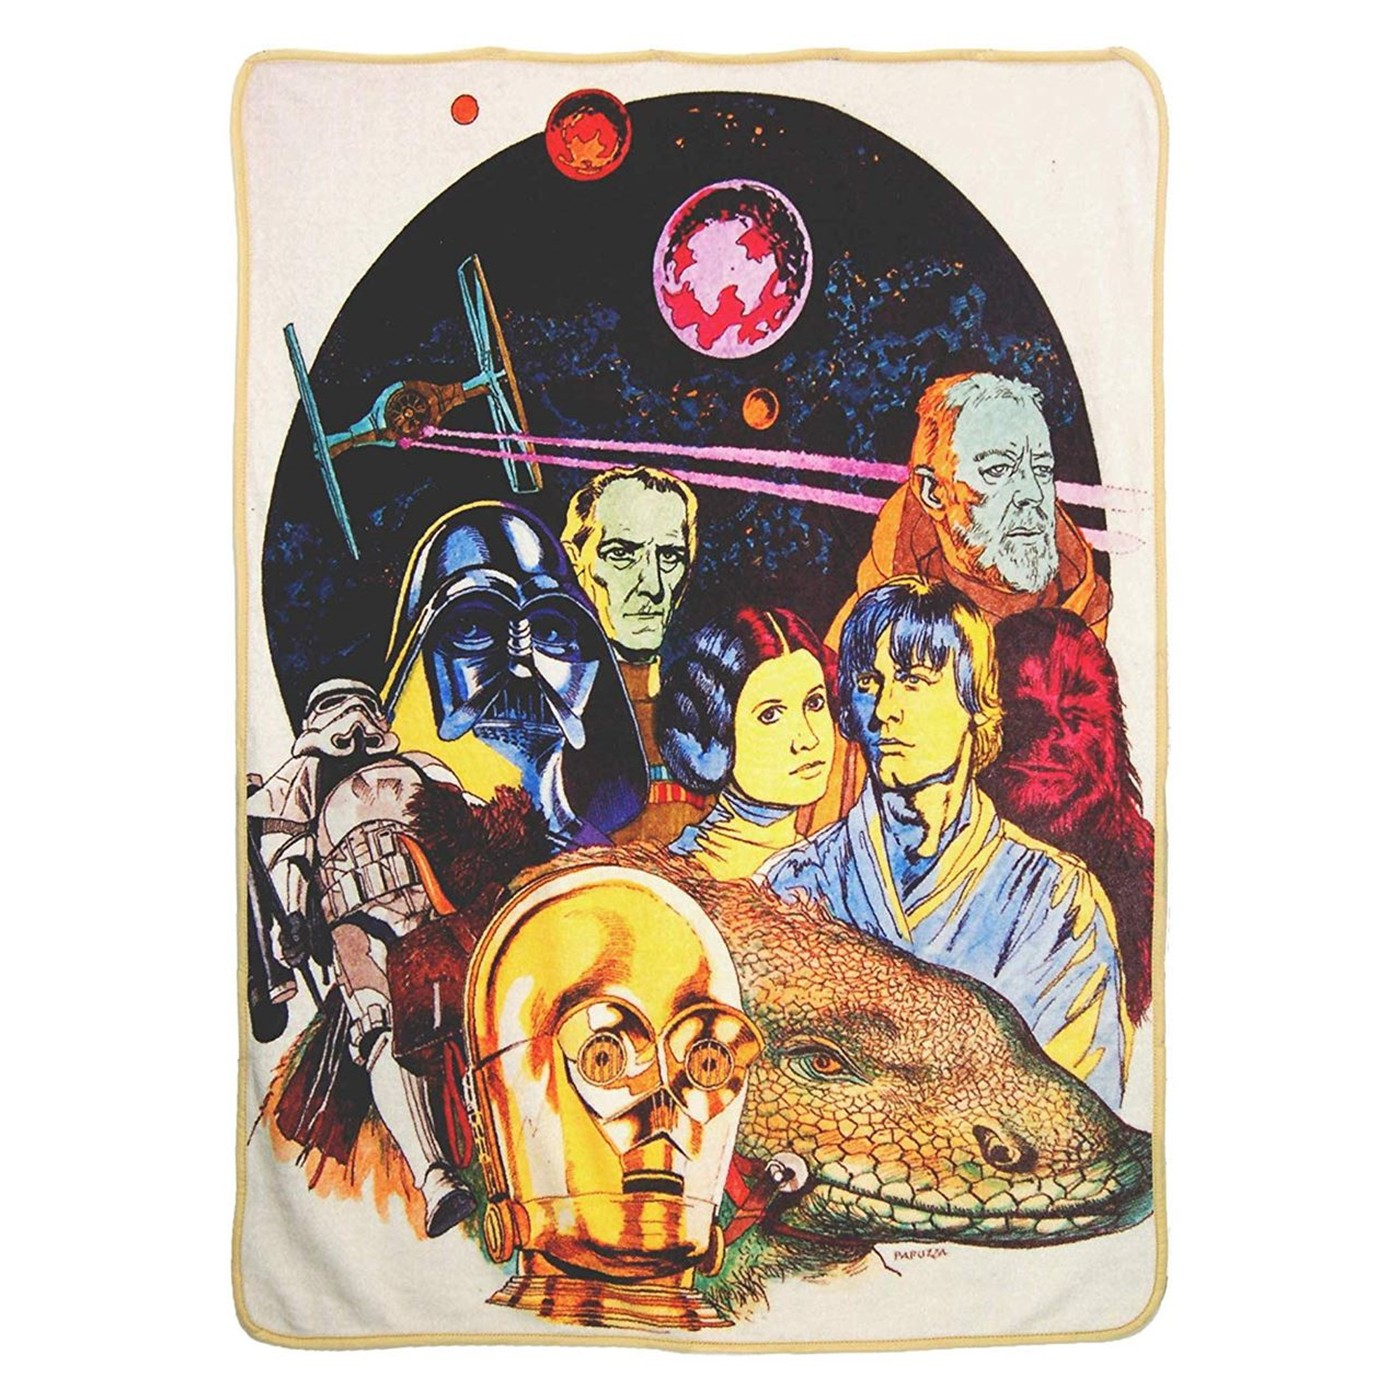 Star Wars Classic Retro Collage Blanket